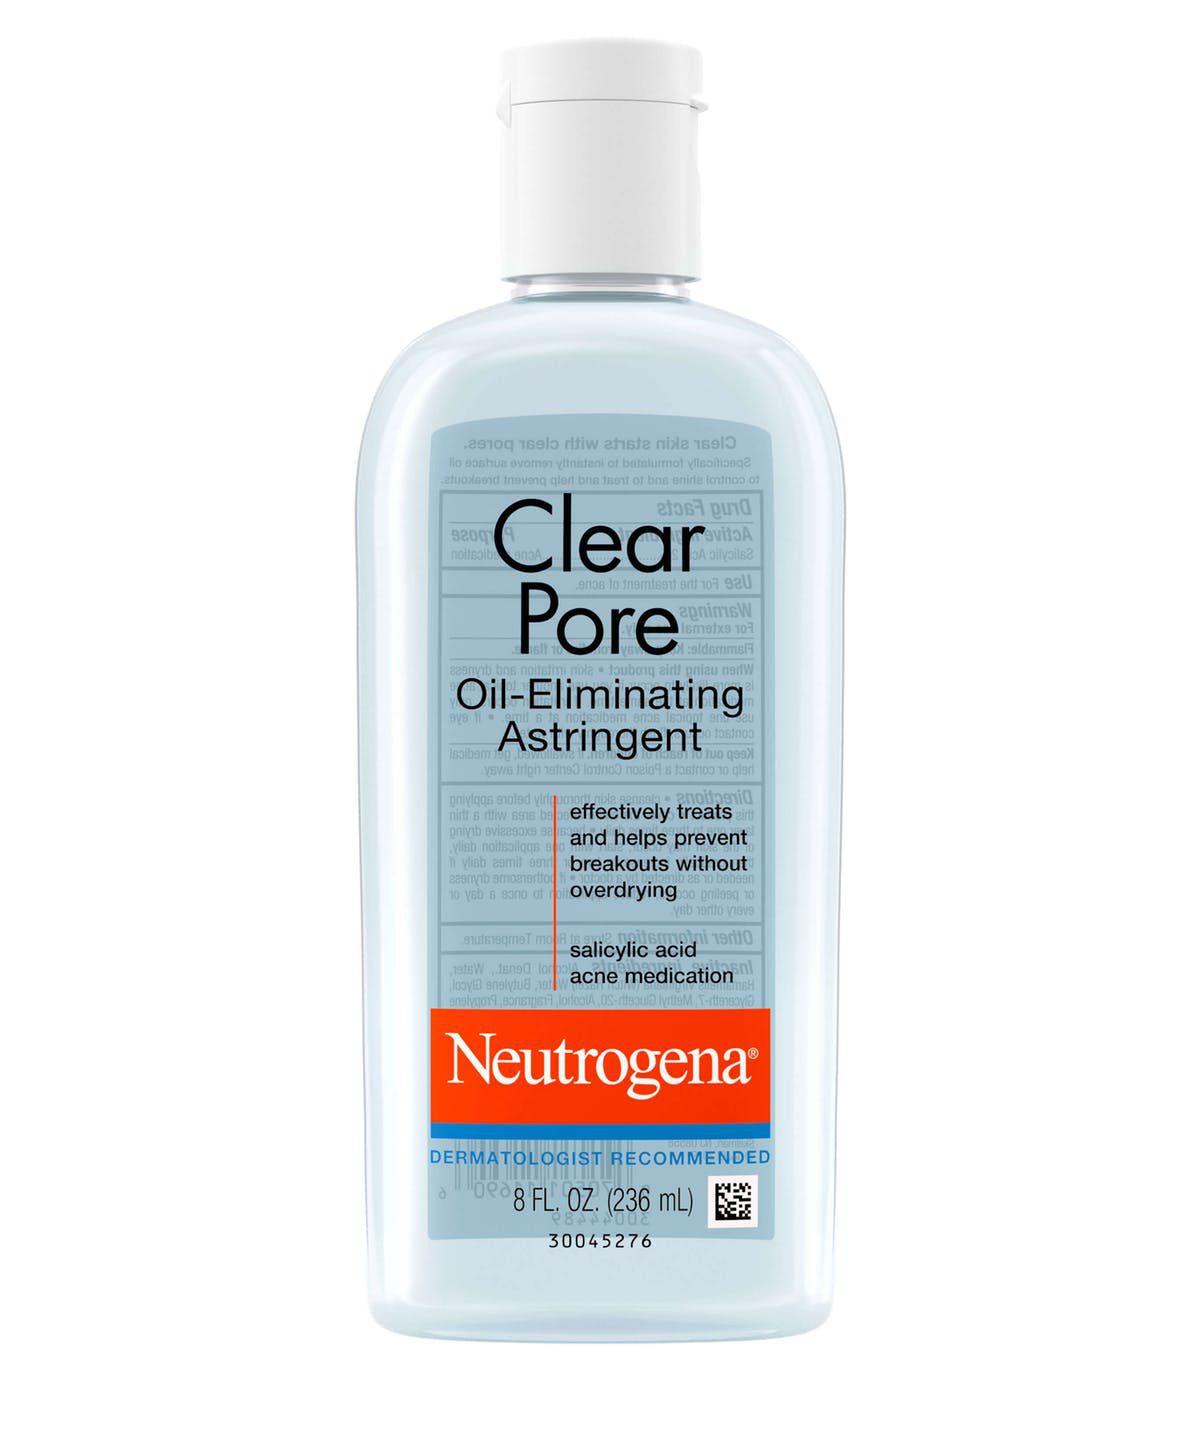 neutrogena clear pore oil eliminating astringent